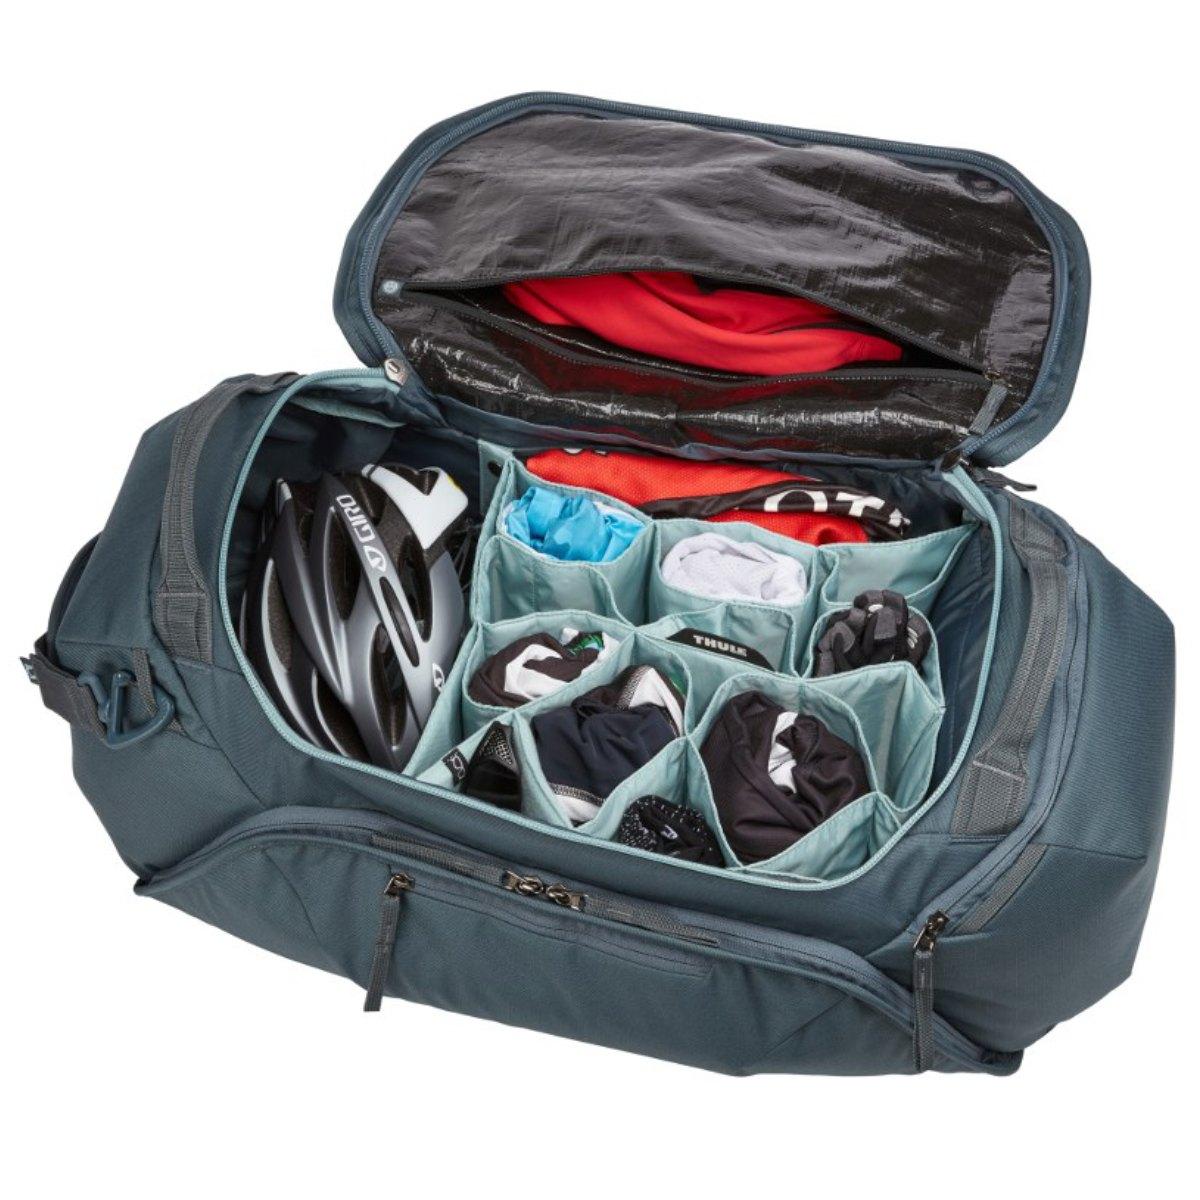 sac-de-voyage-thule-roundtrip-bike-gear-gris-fonce